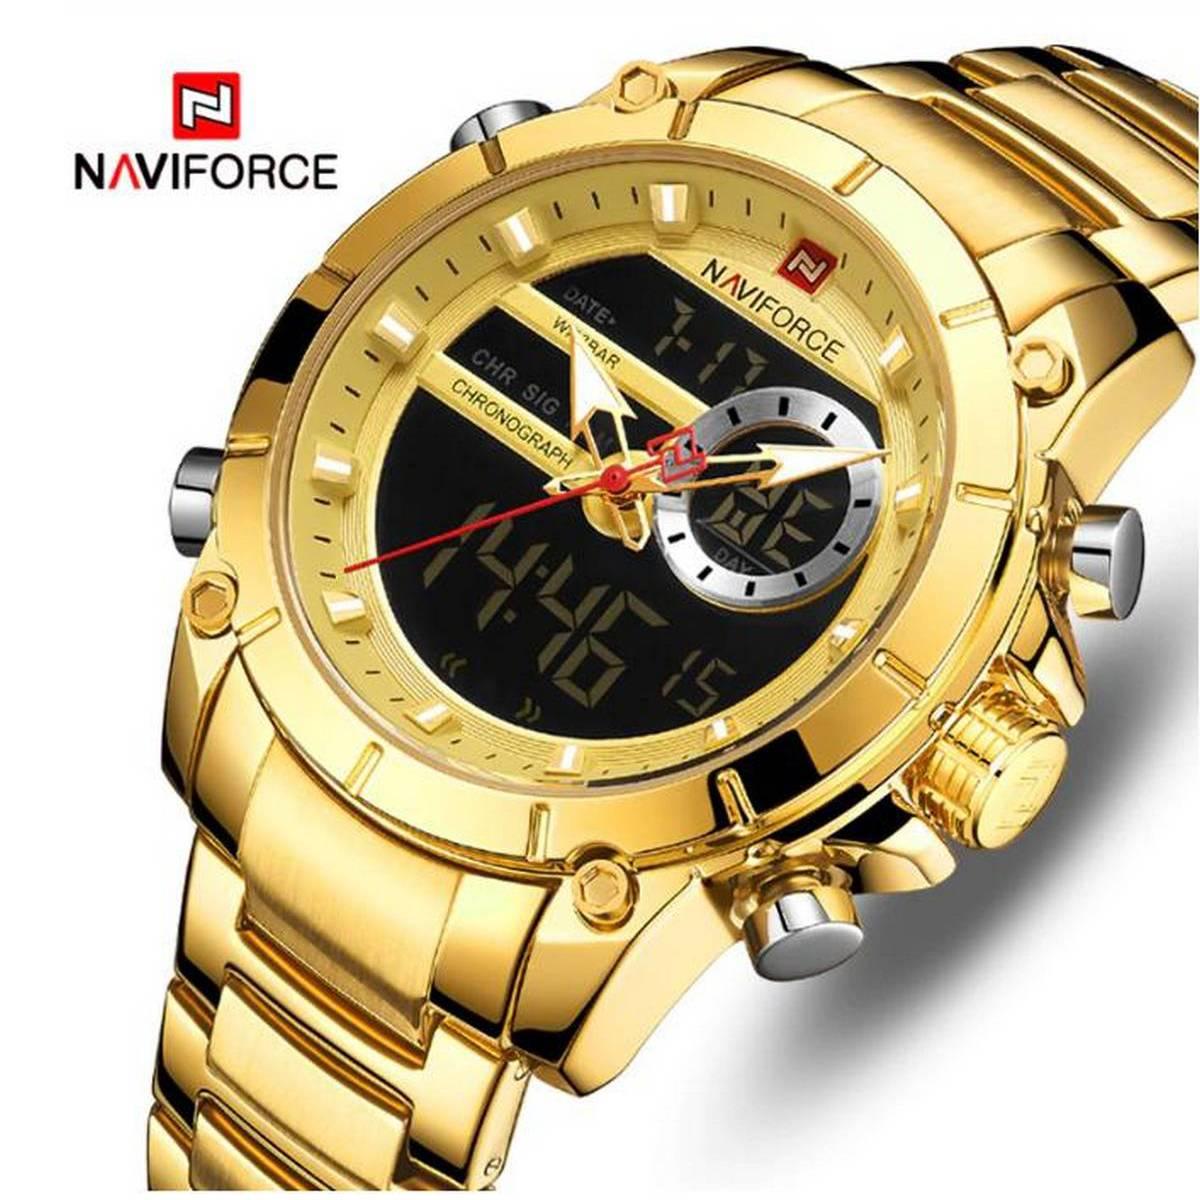 Naviforce Waterproof Japan Quartz Dual Display Watch With Brand Box - NF9163